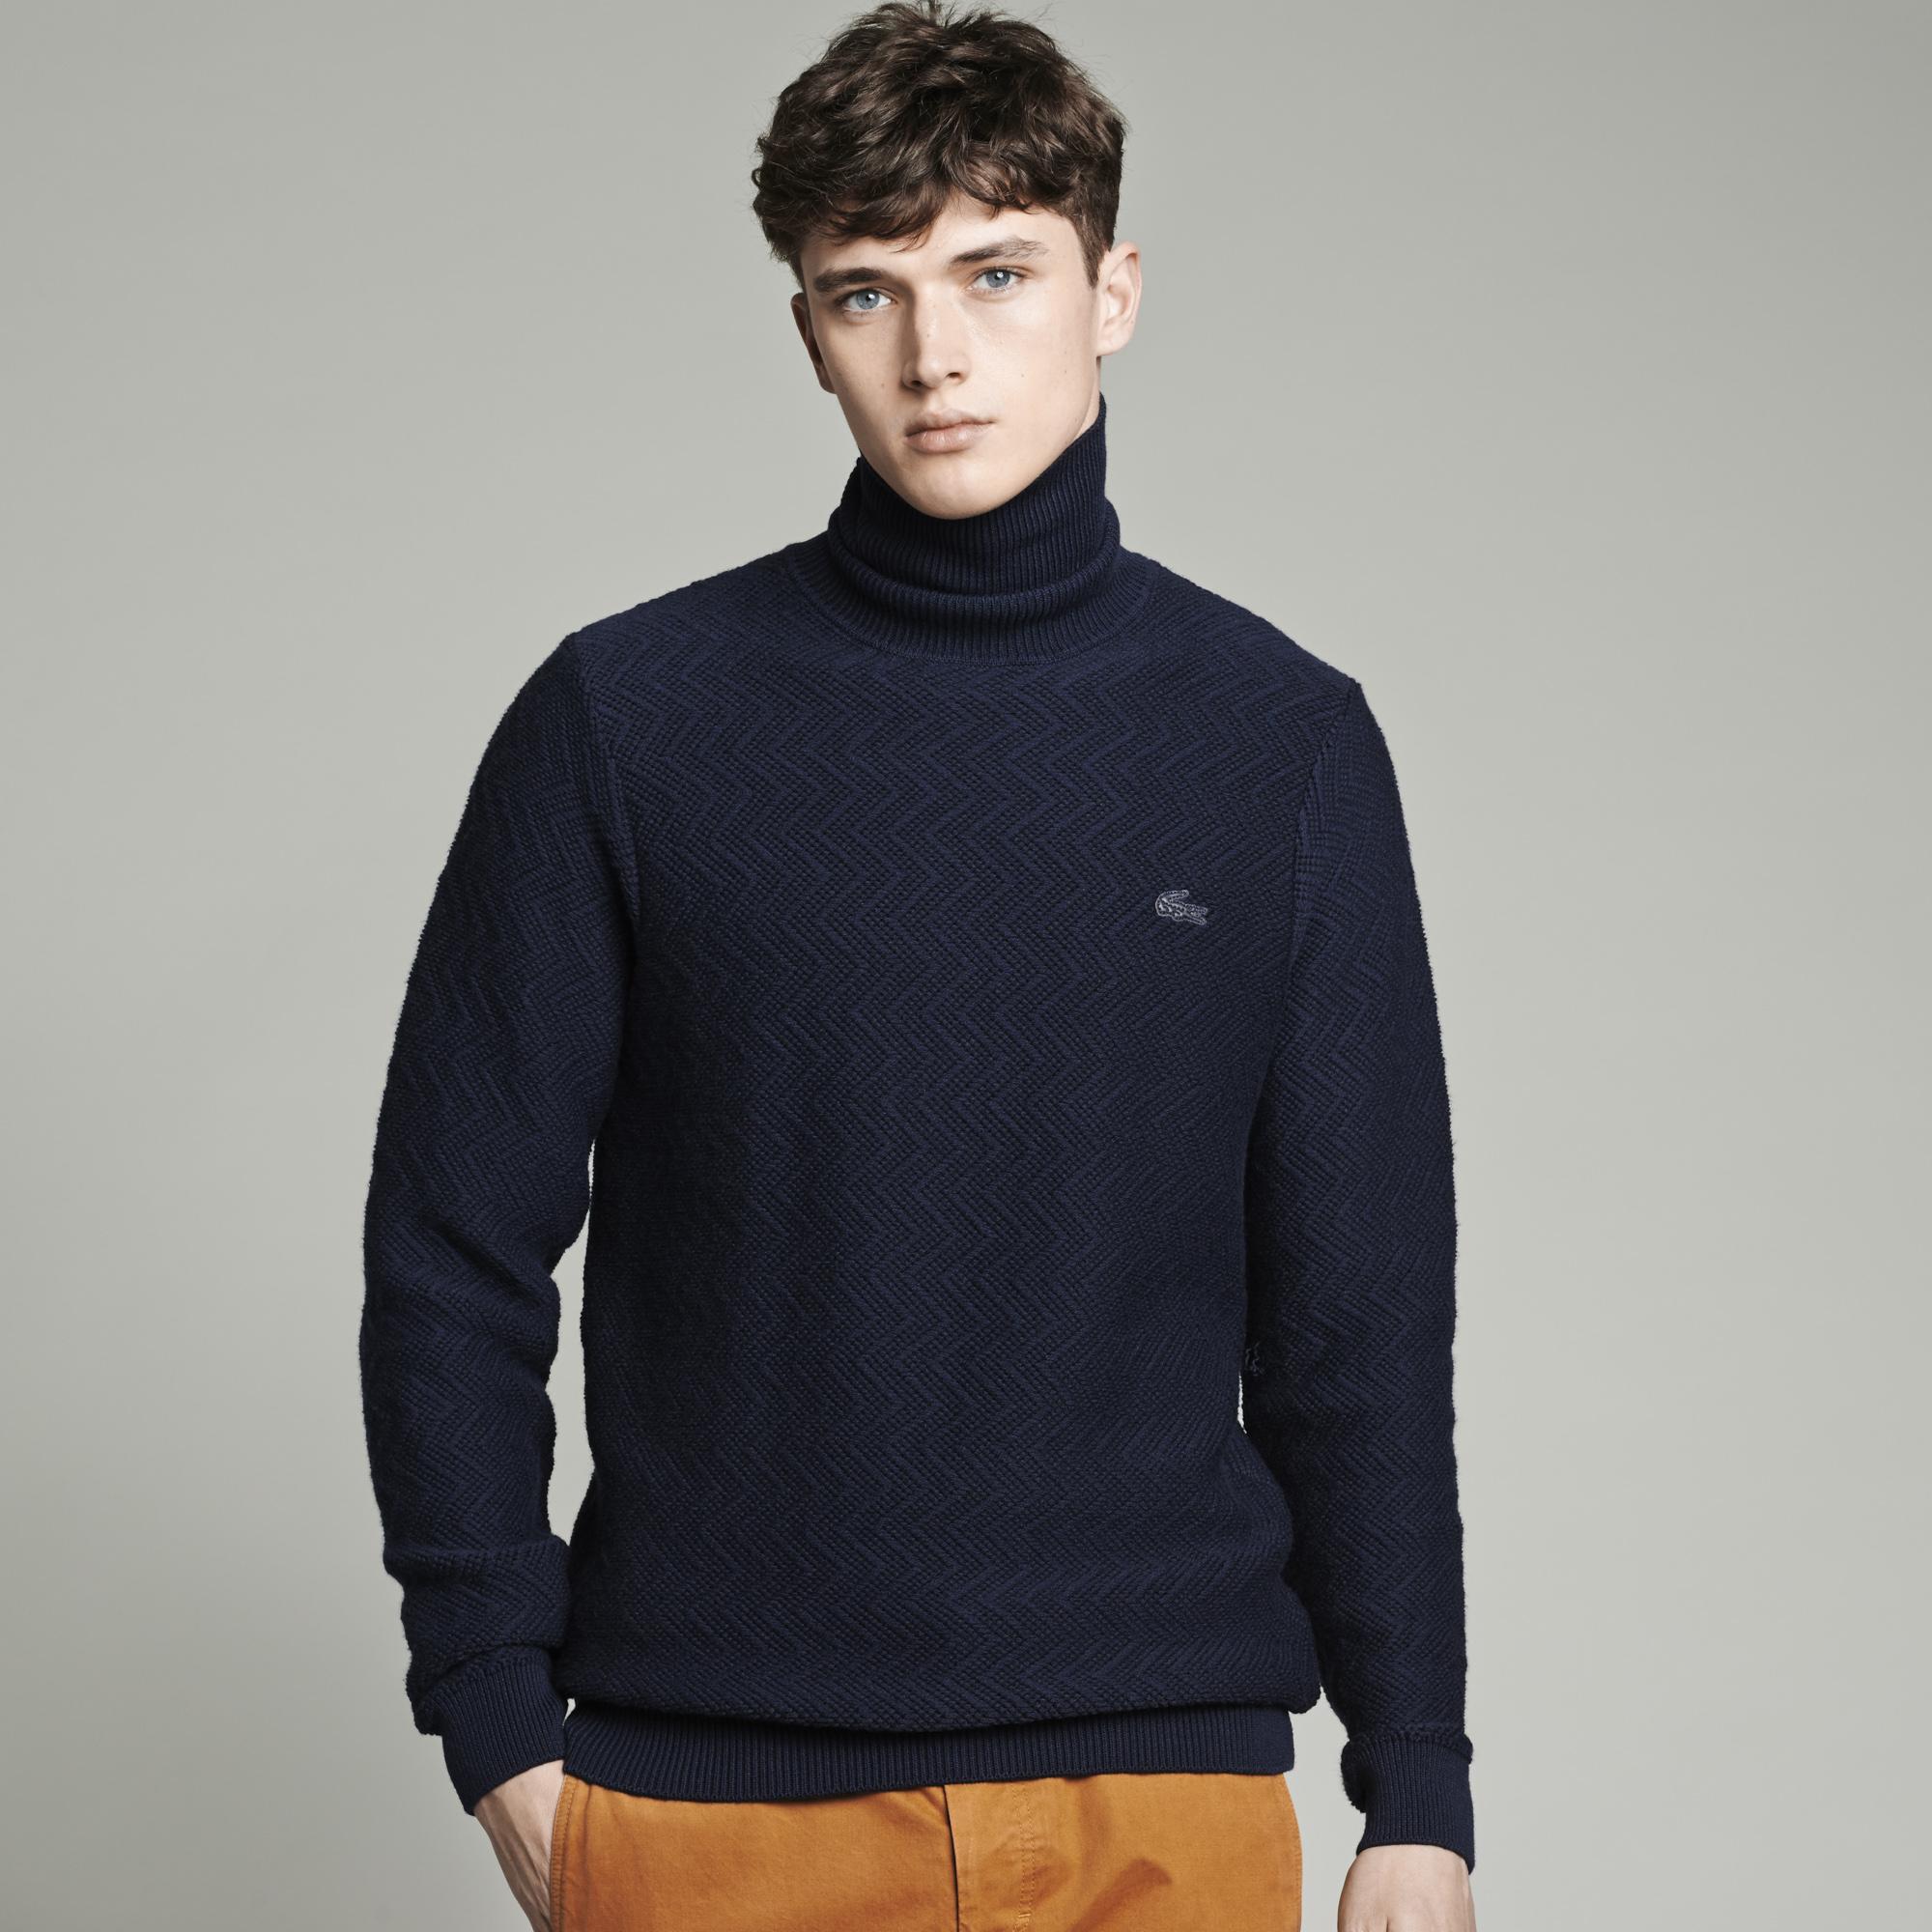 Jersey de cuello vuelto azul marino Lacoste